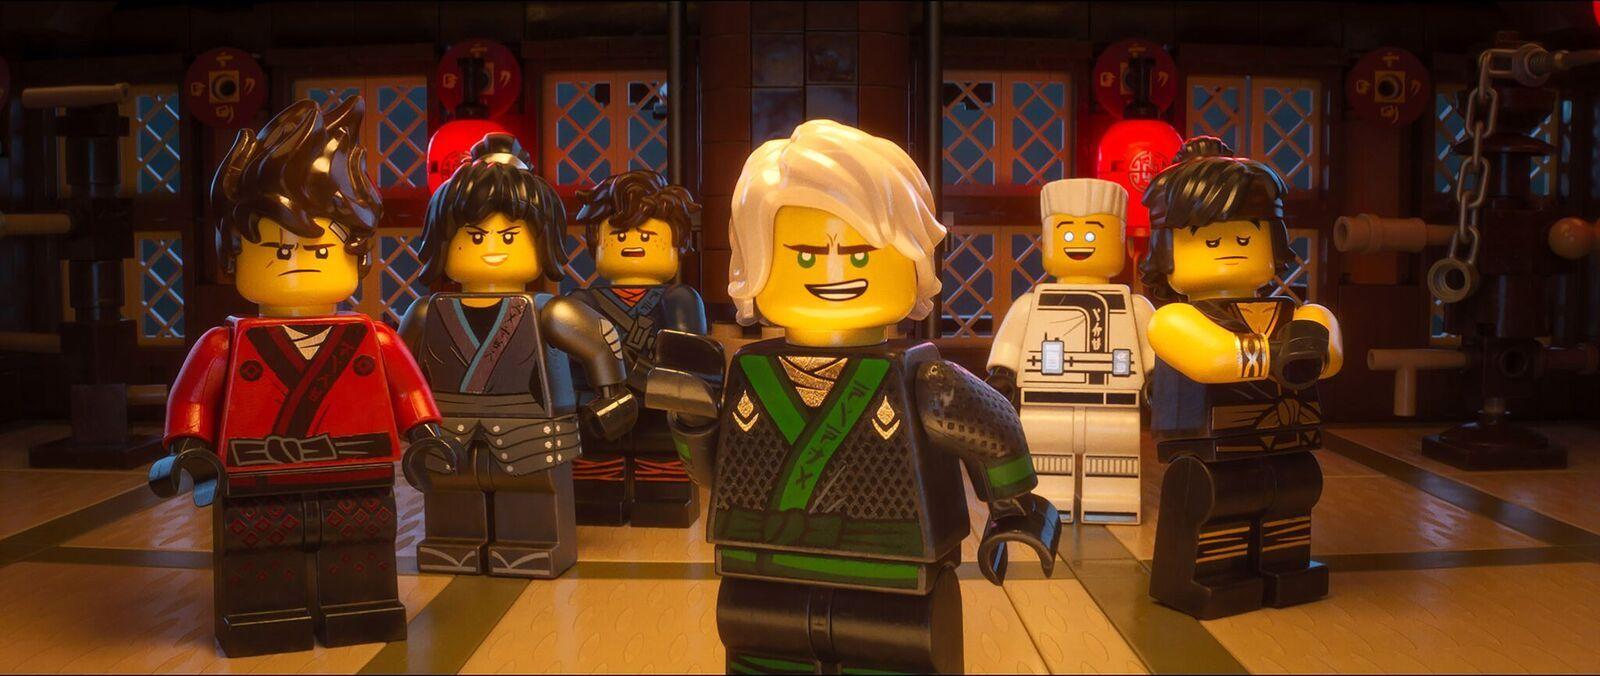 Win A 50 Fandango Gift Card And Go See The Lego Ninjago Movie